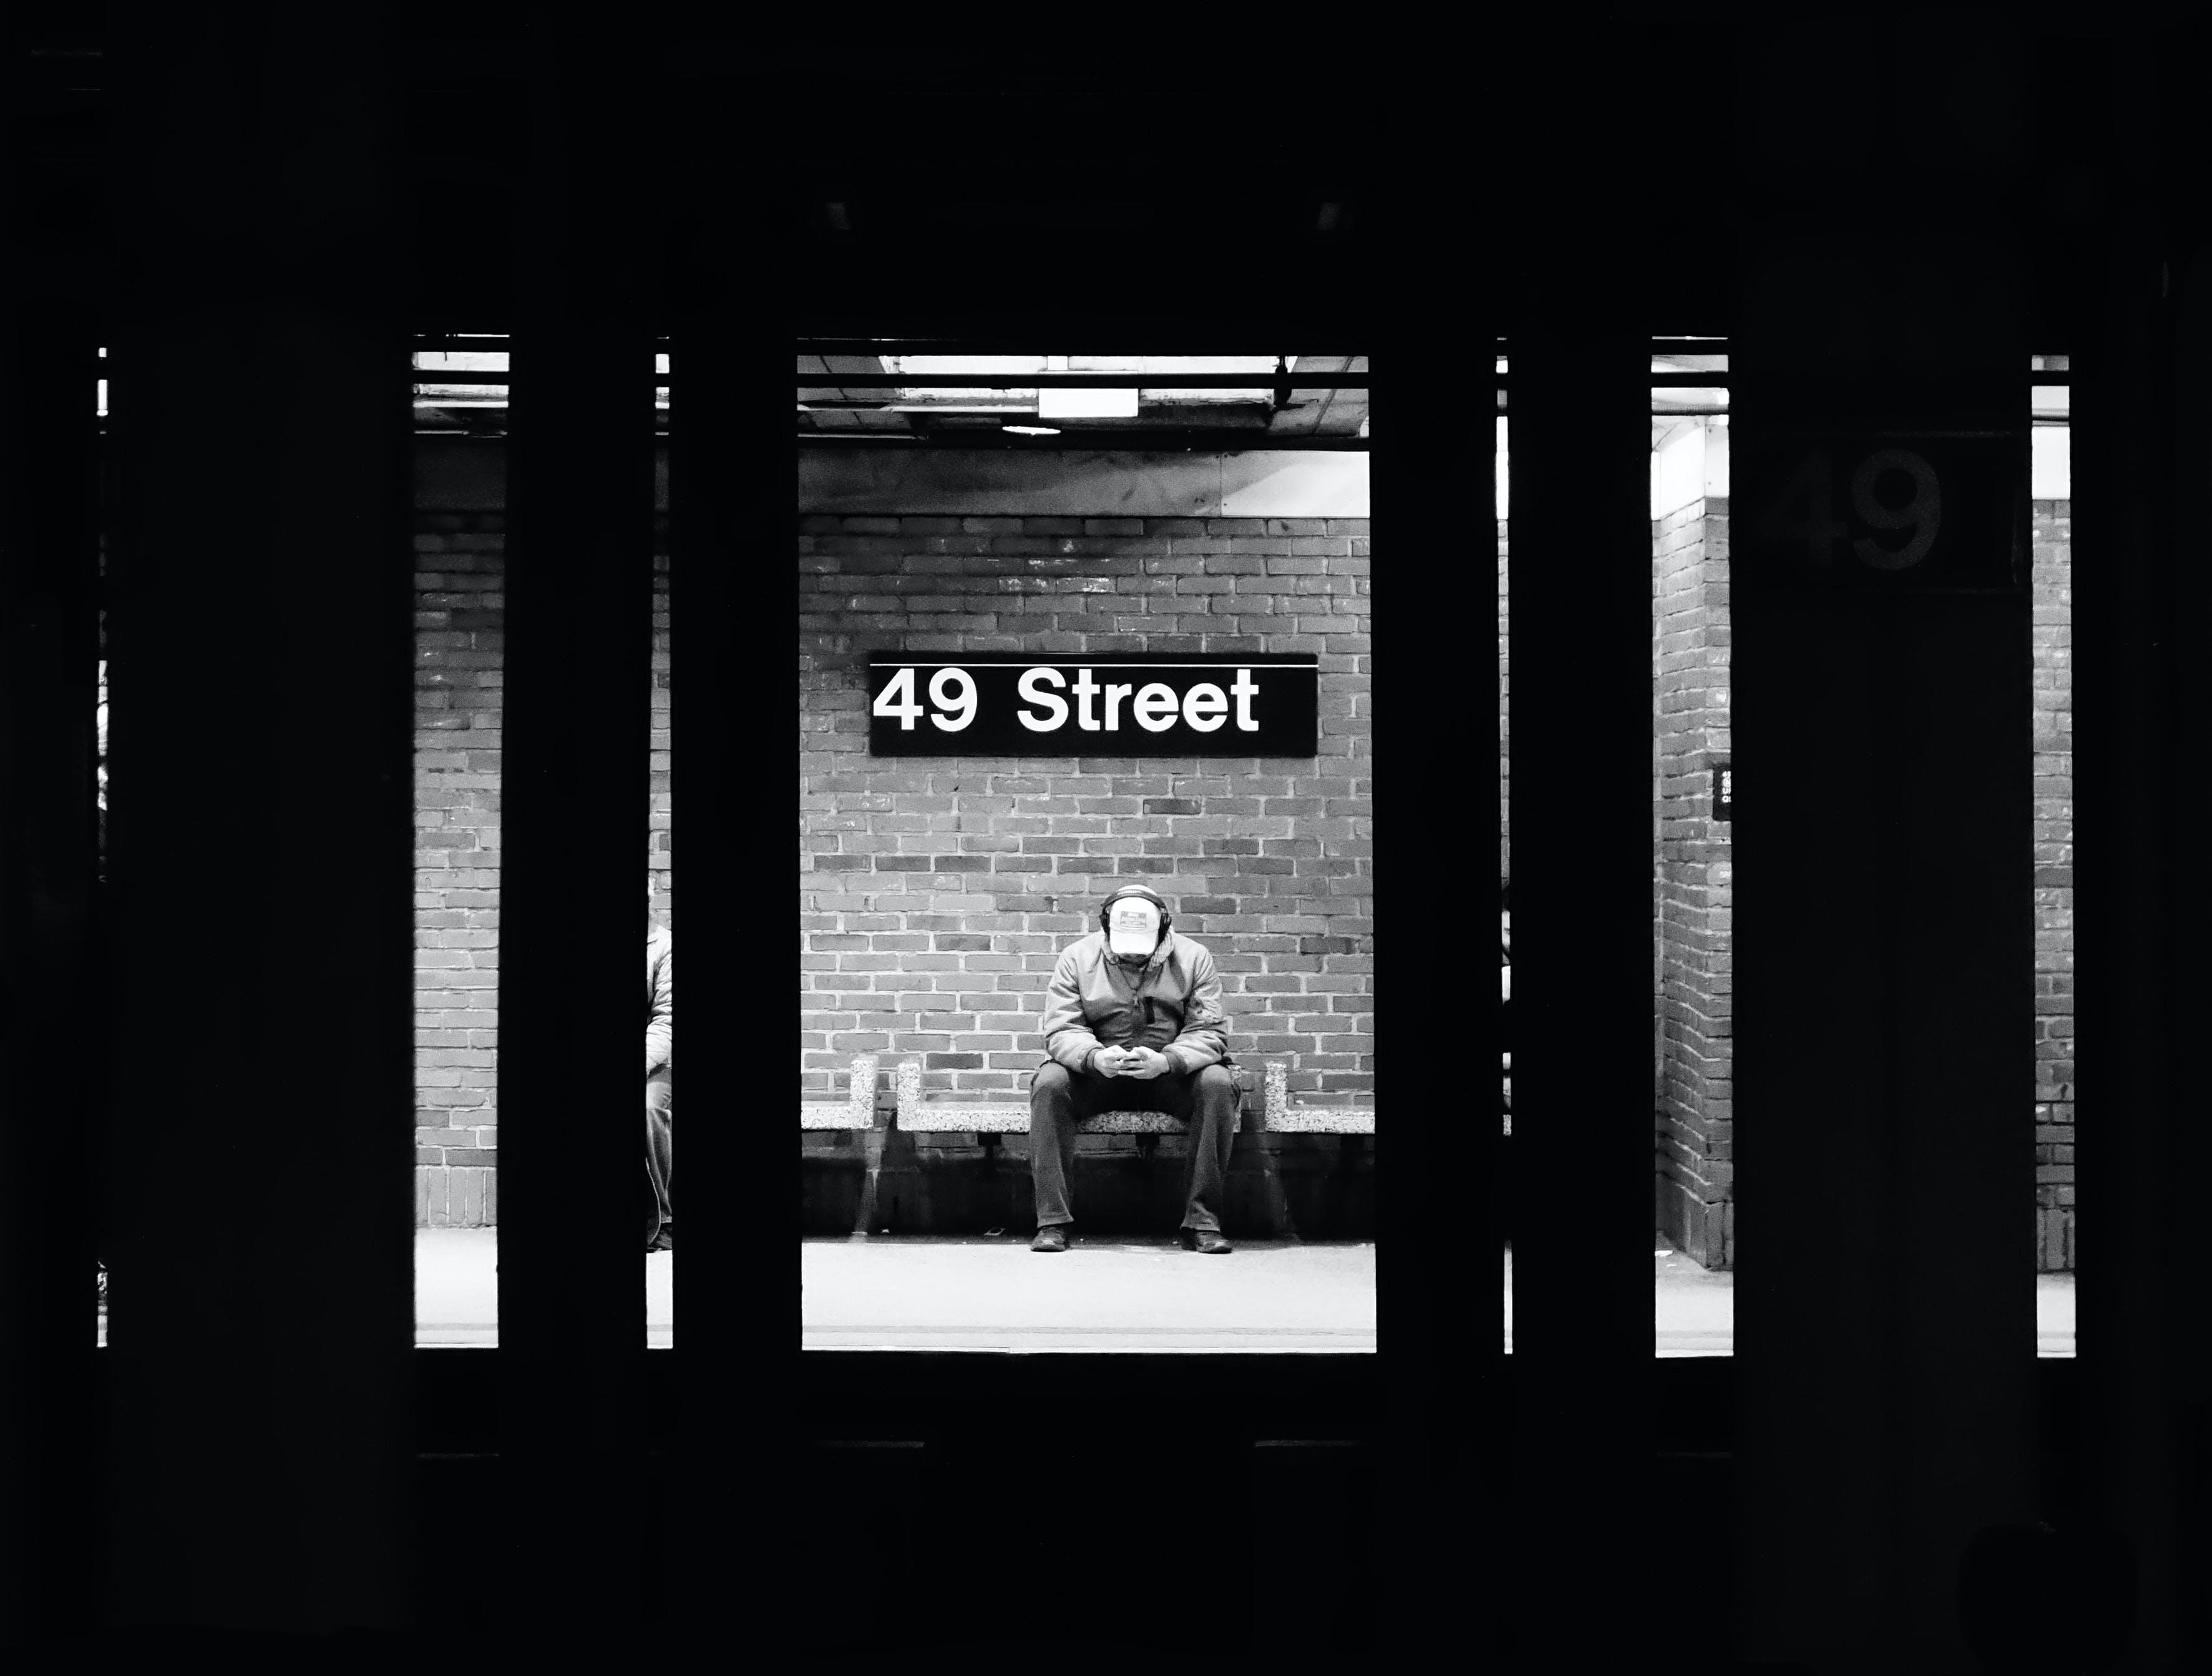 Free stock photo of new york city, subway platform